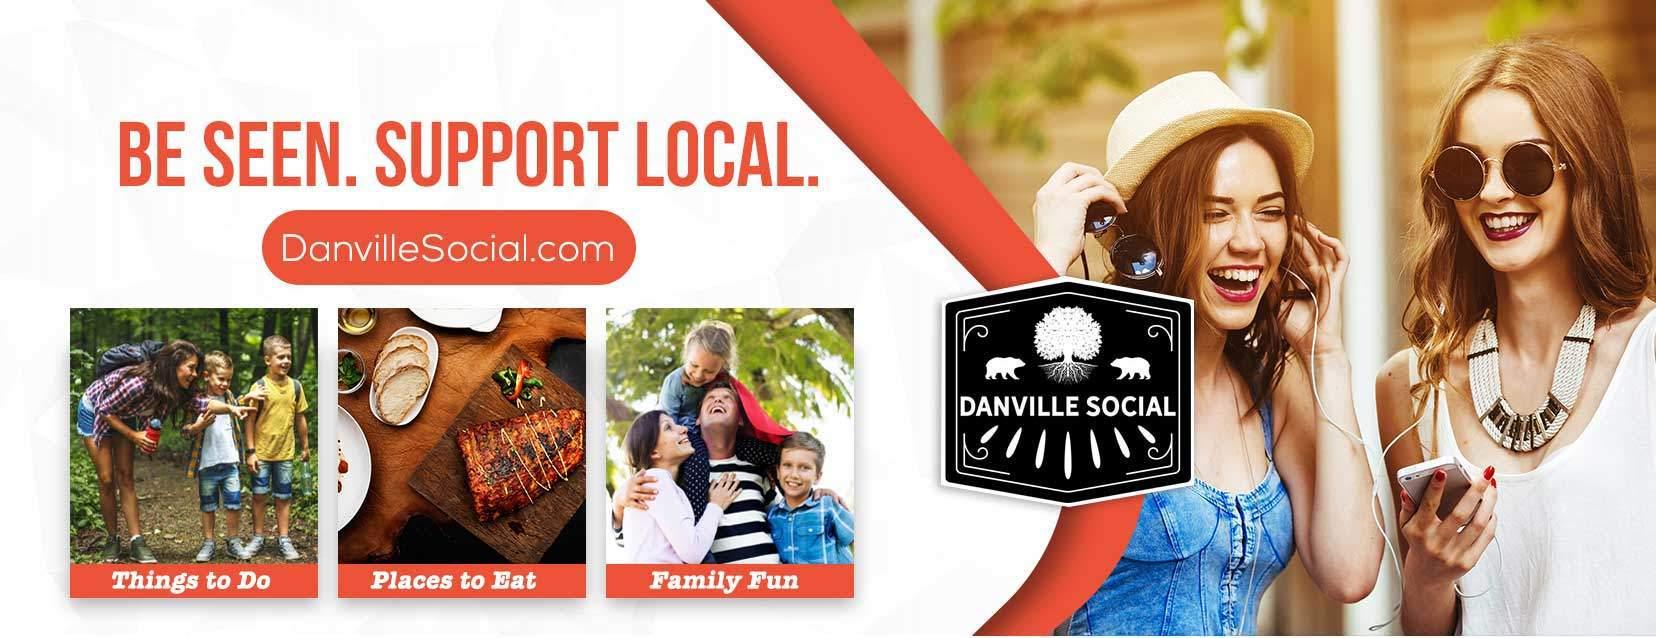 Danville Social Contact Us